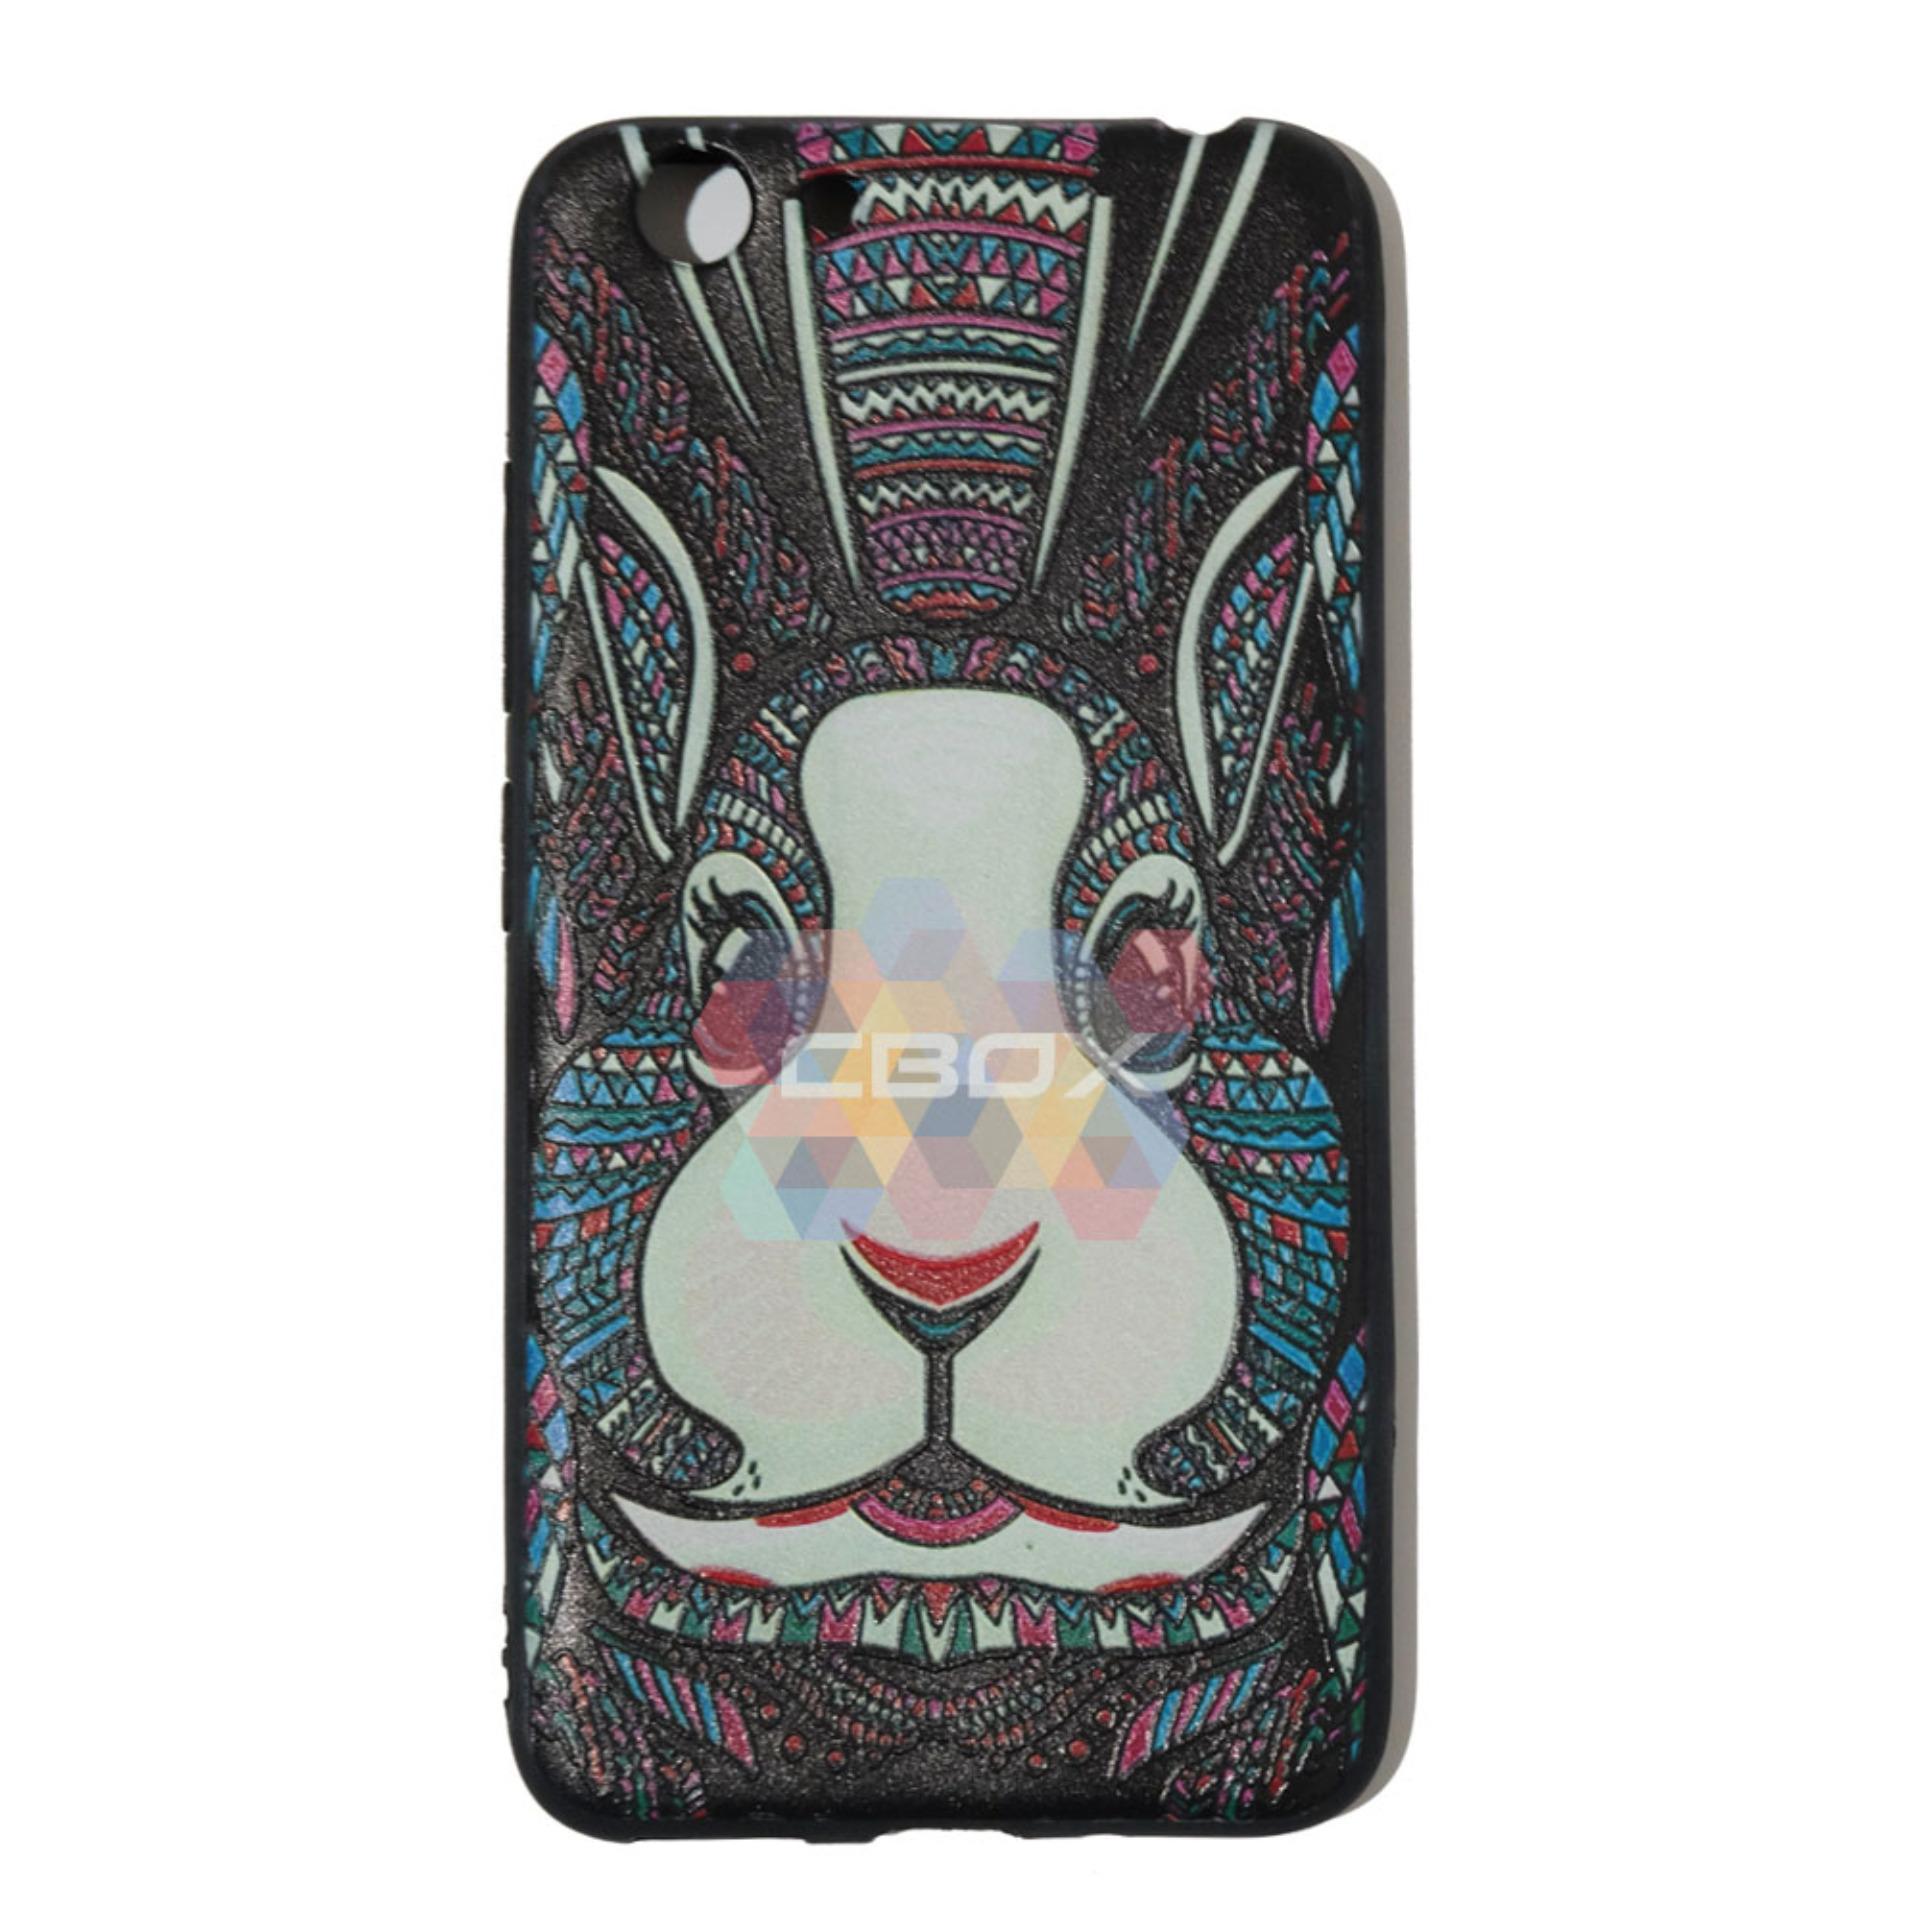 MR Case Etnic Luxo Rimba Rabbit Vivo Y53 2017 Soft Back Cover Animals .